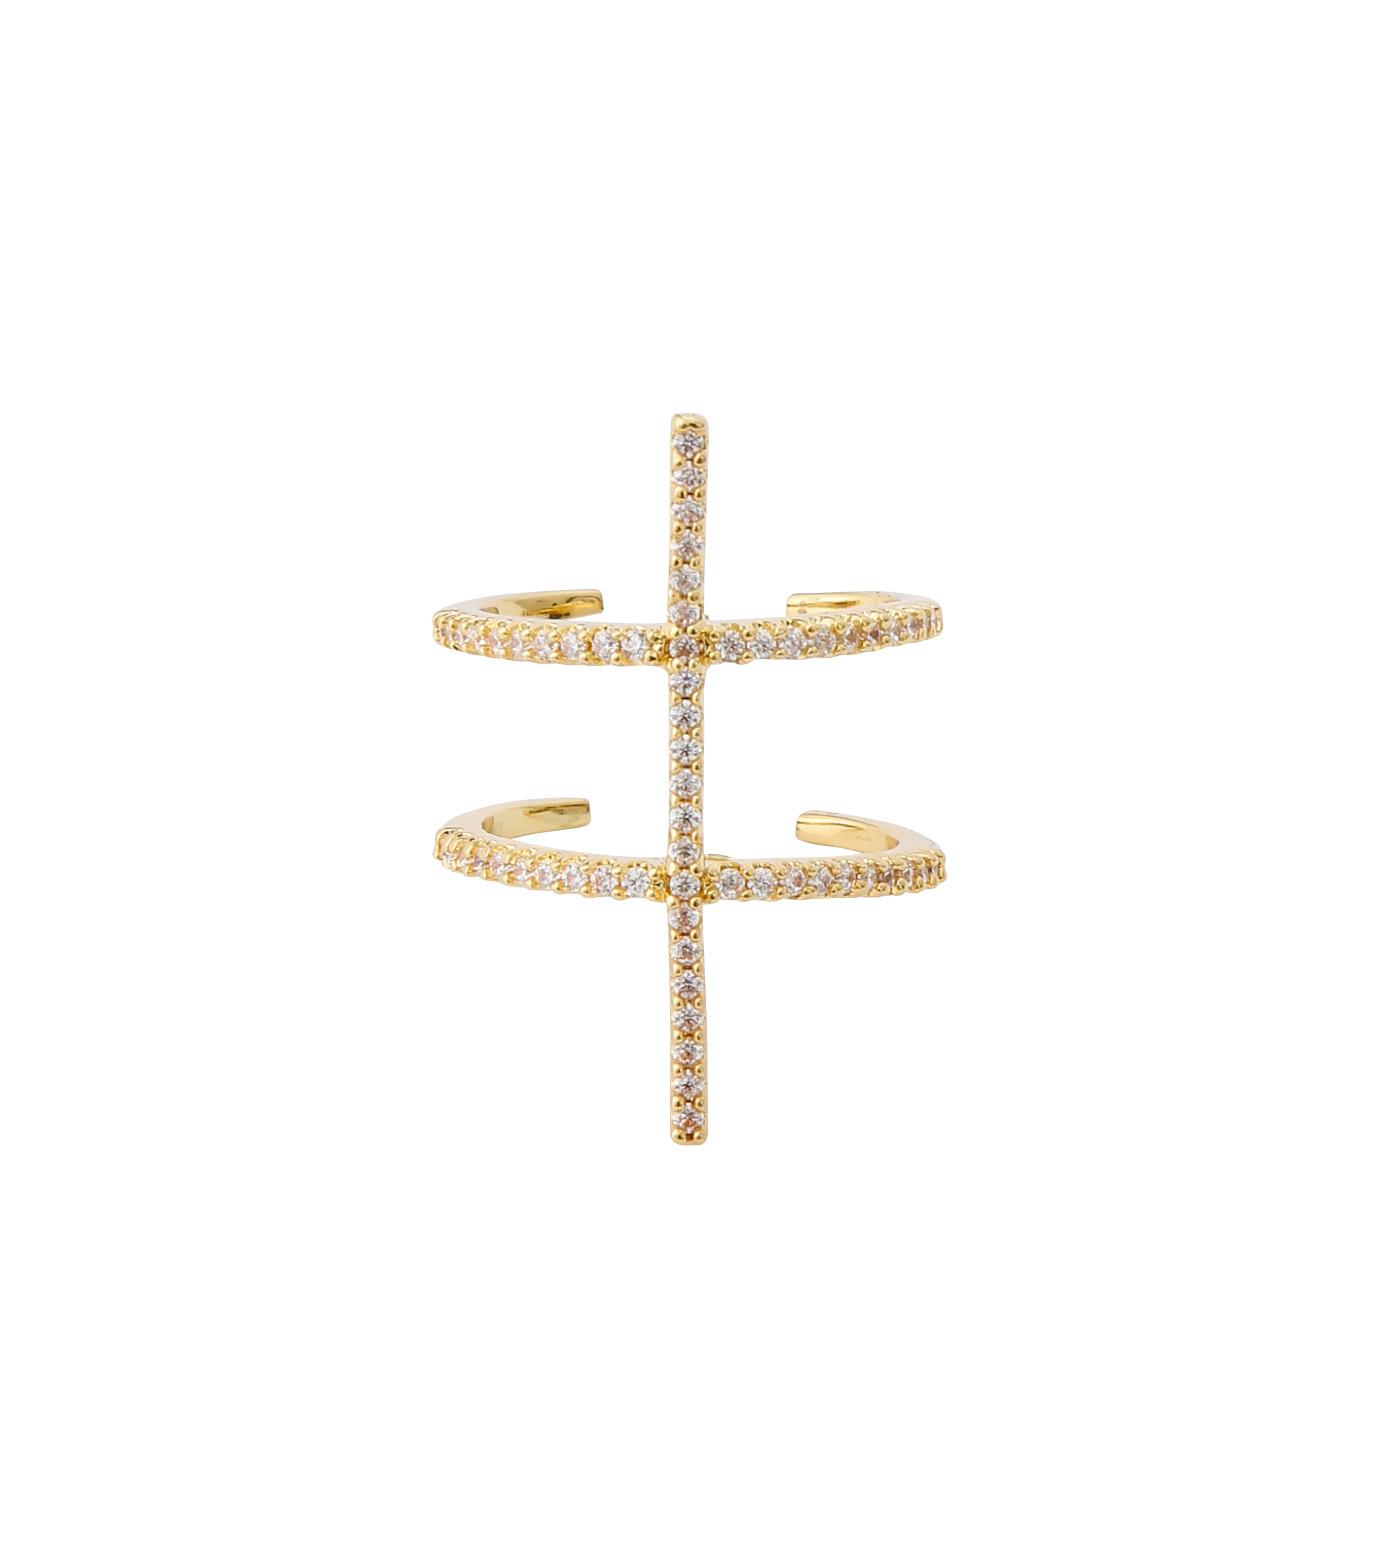 Fallon(ファロン)のPave Ladder Ring-GOLD(リング/ring)-FR21550-2 拡大詳細画像1